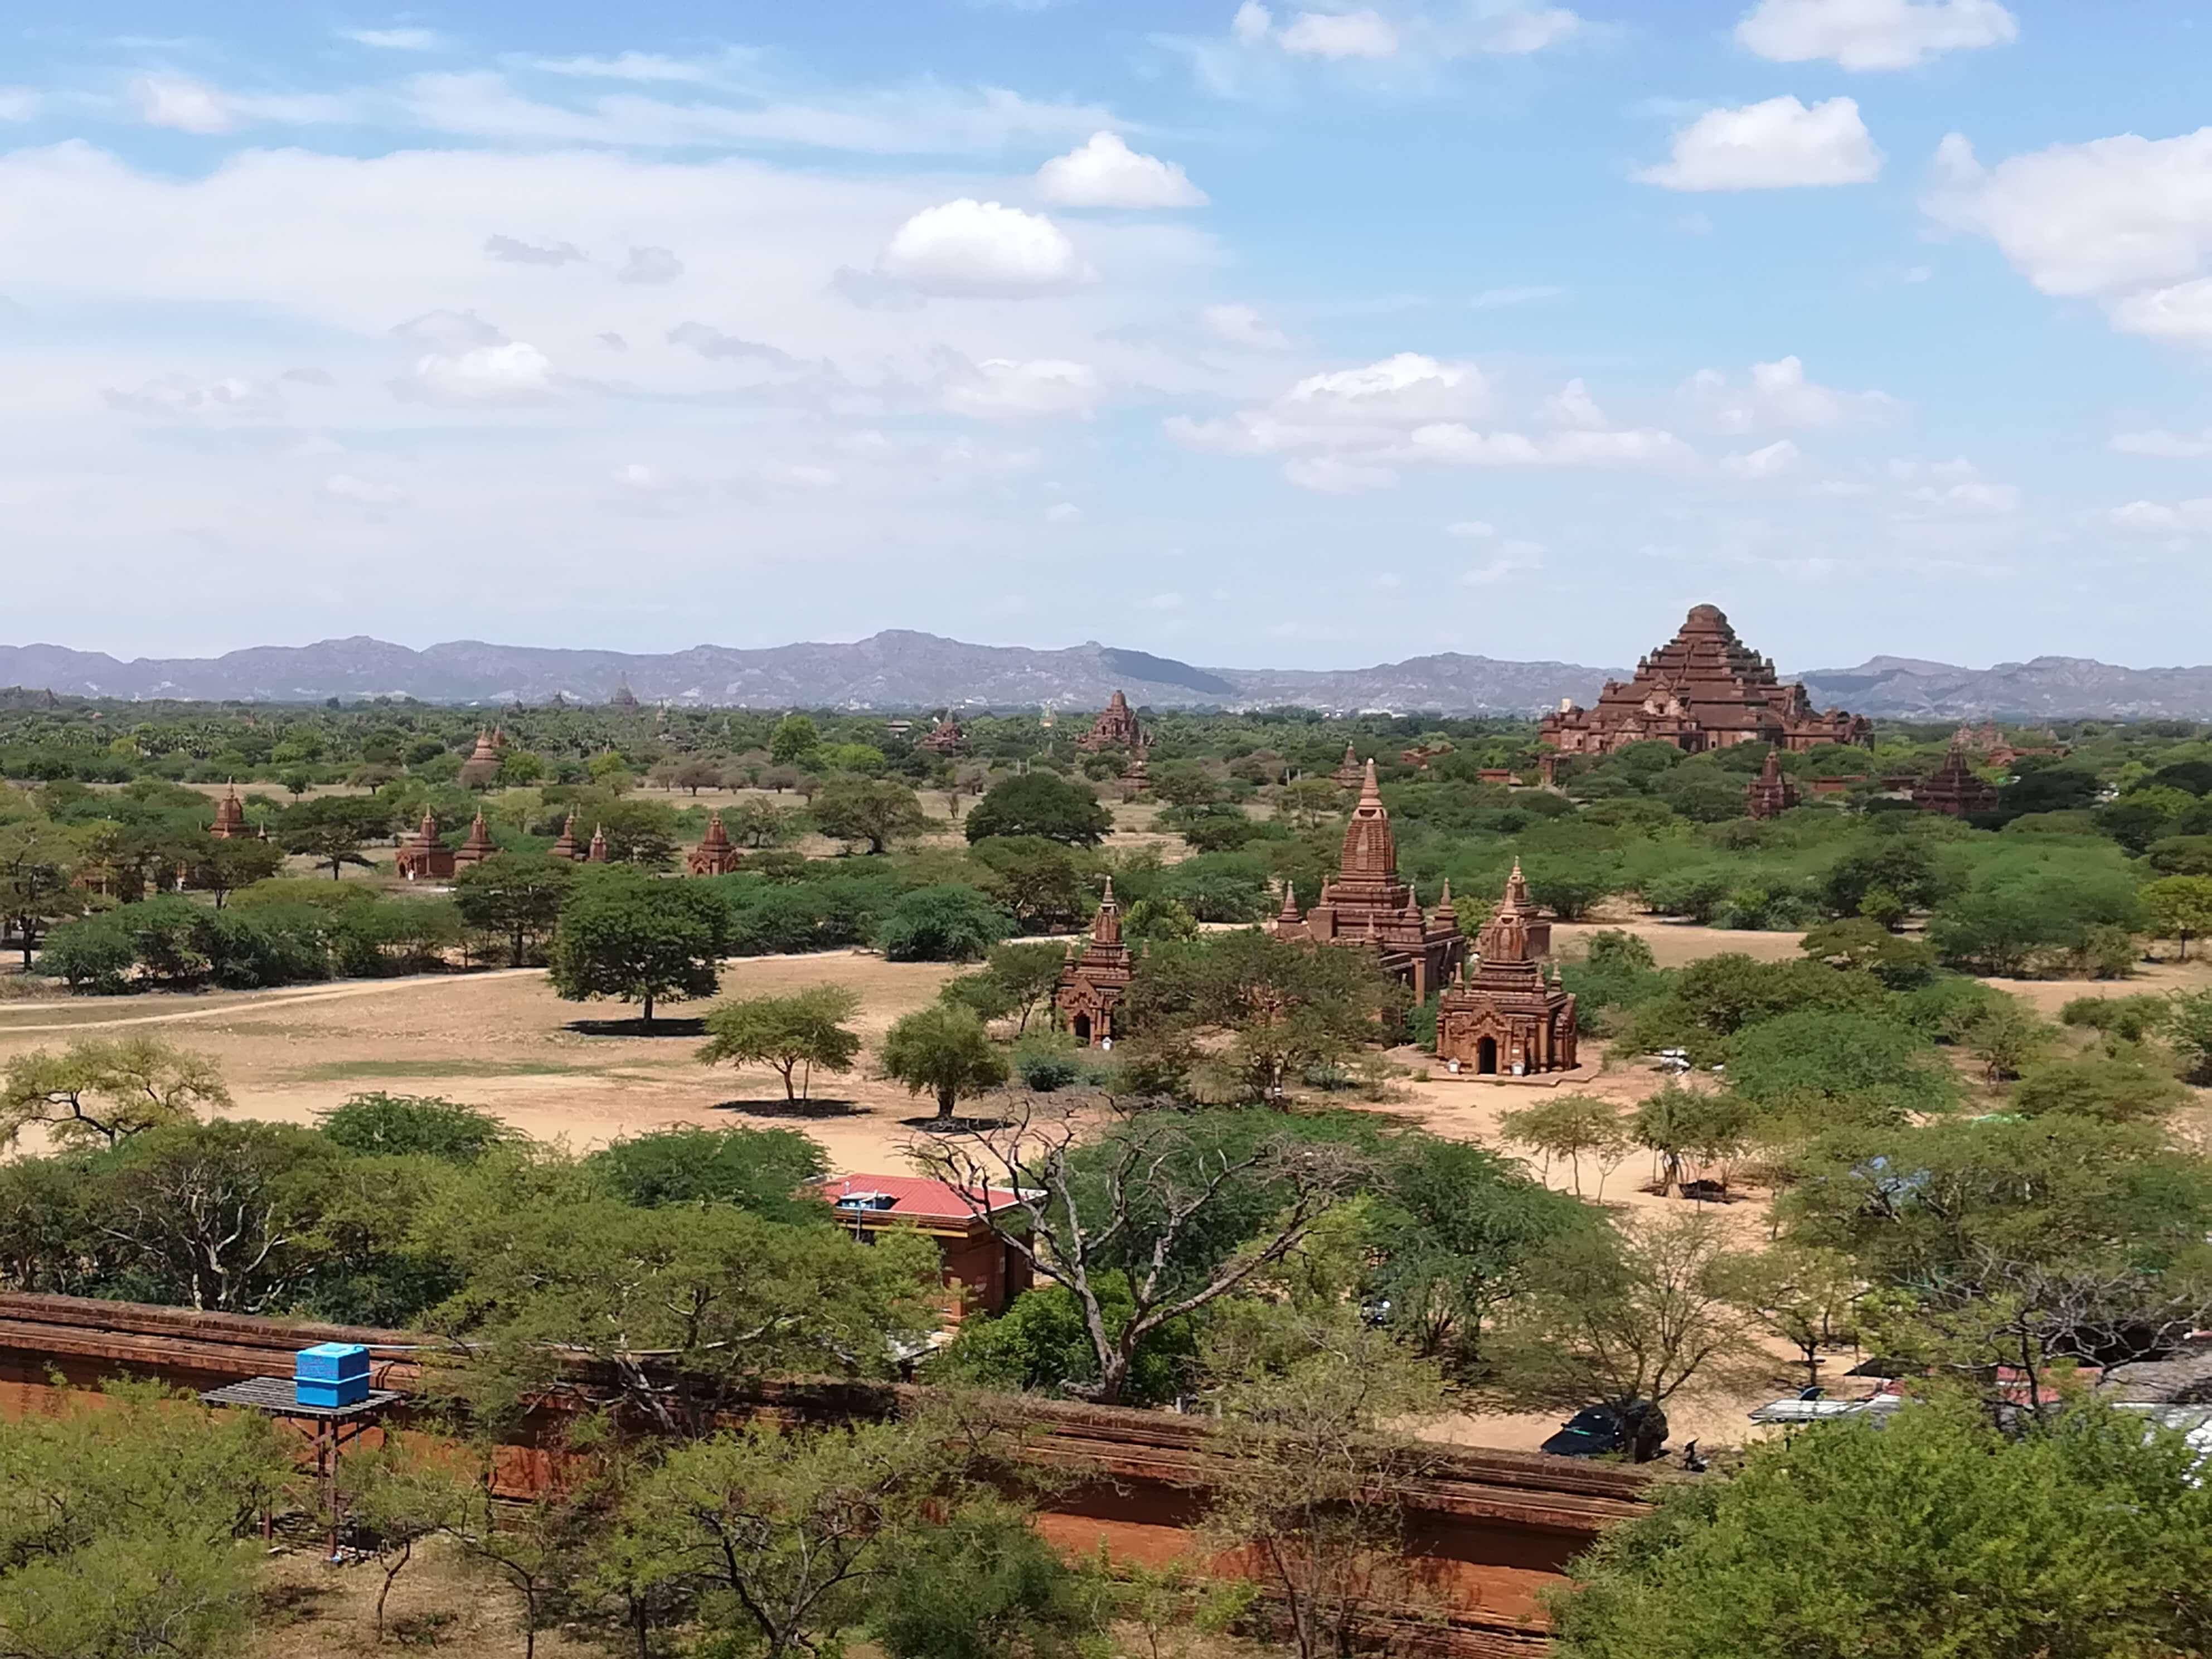 image of loka hteik pan temple sahc